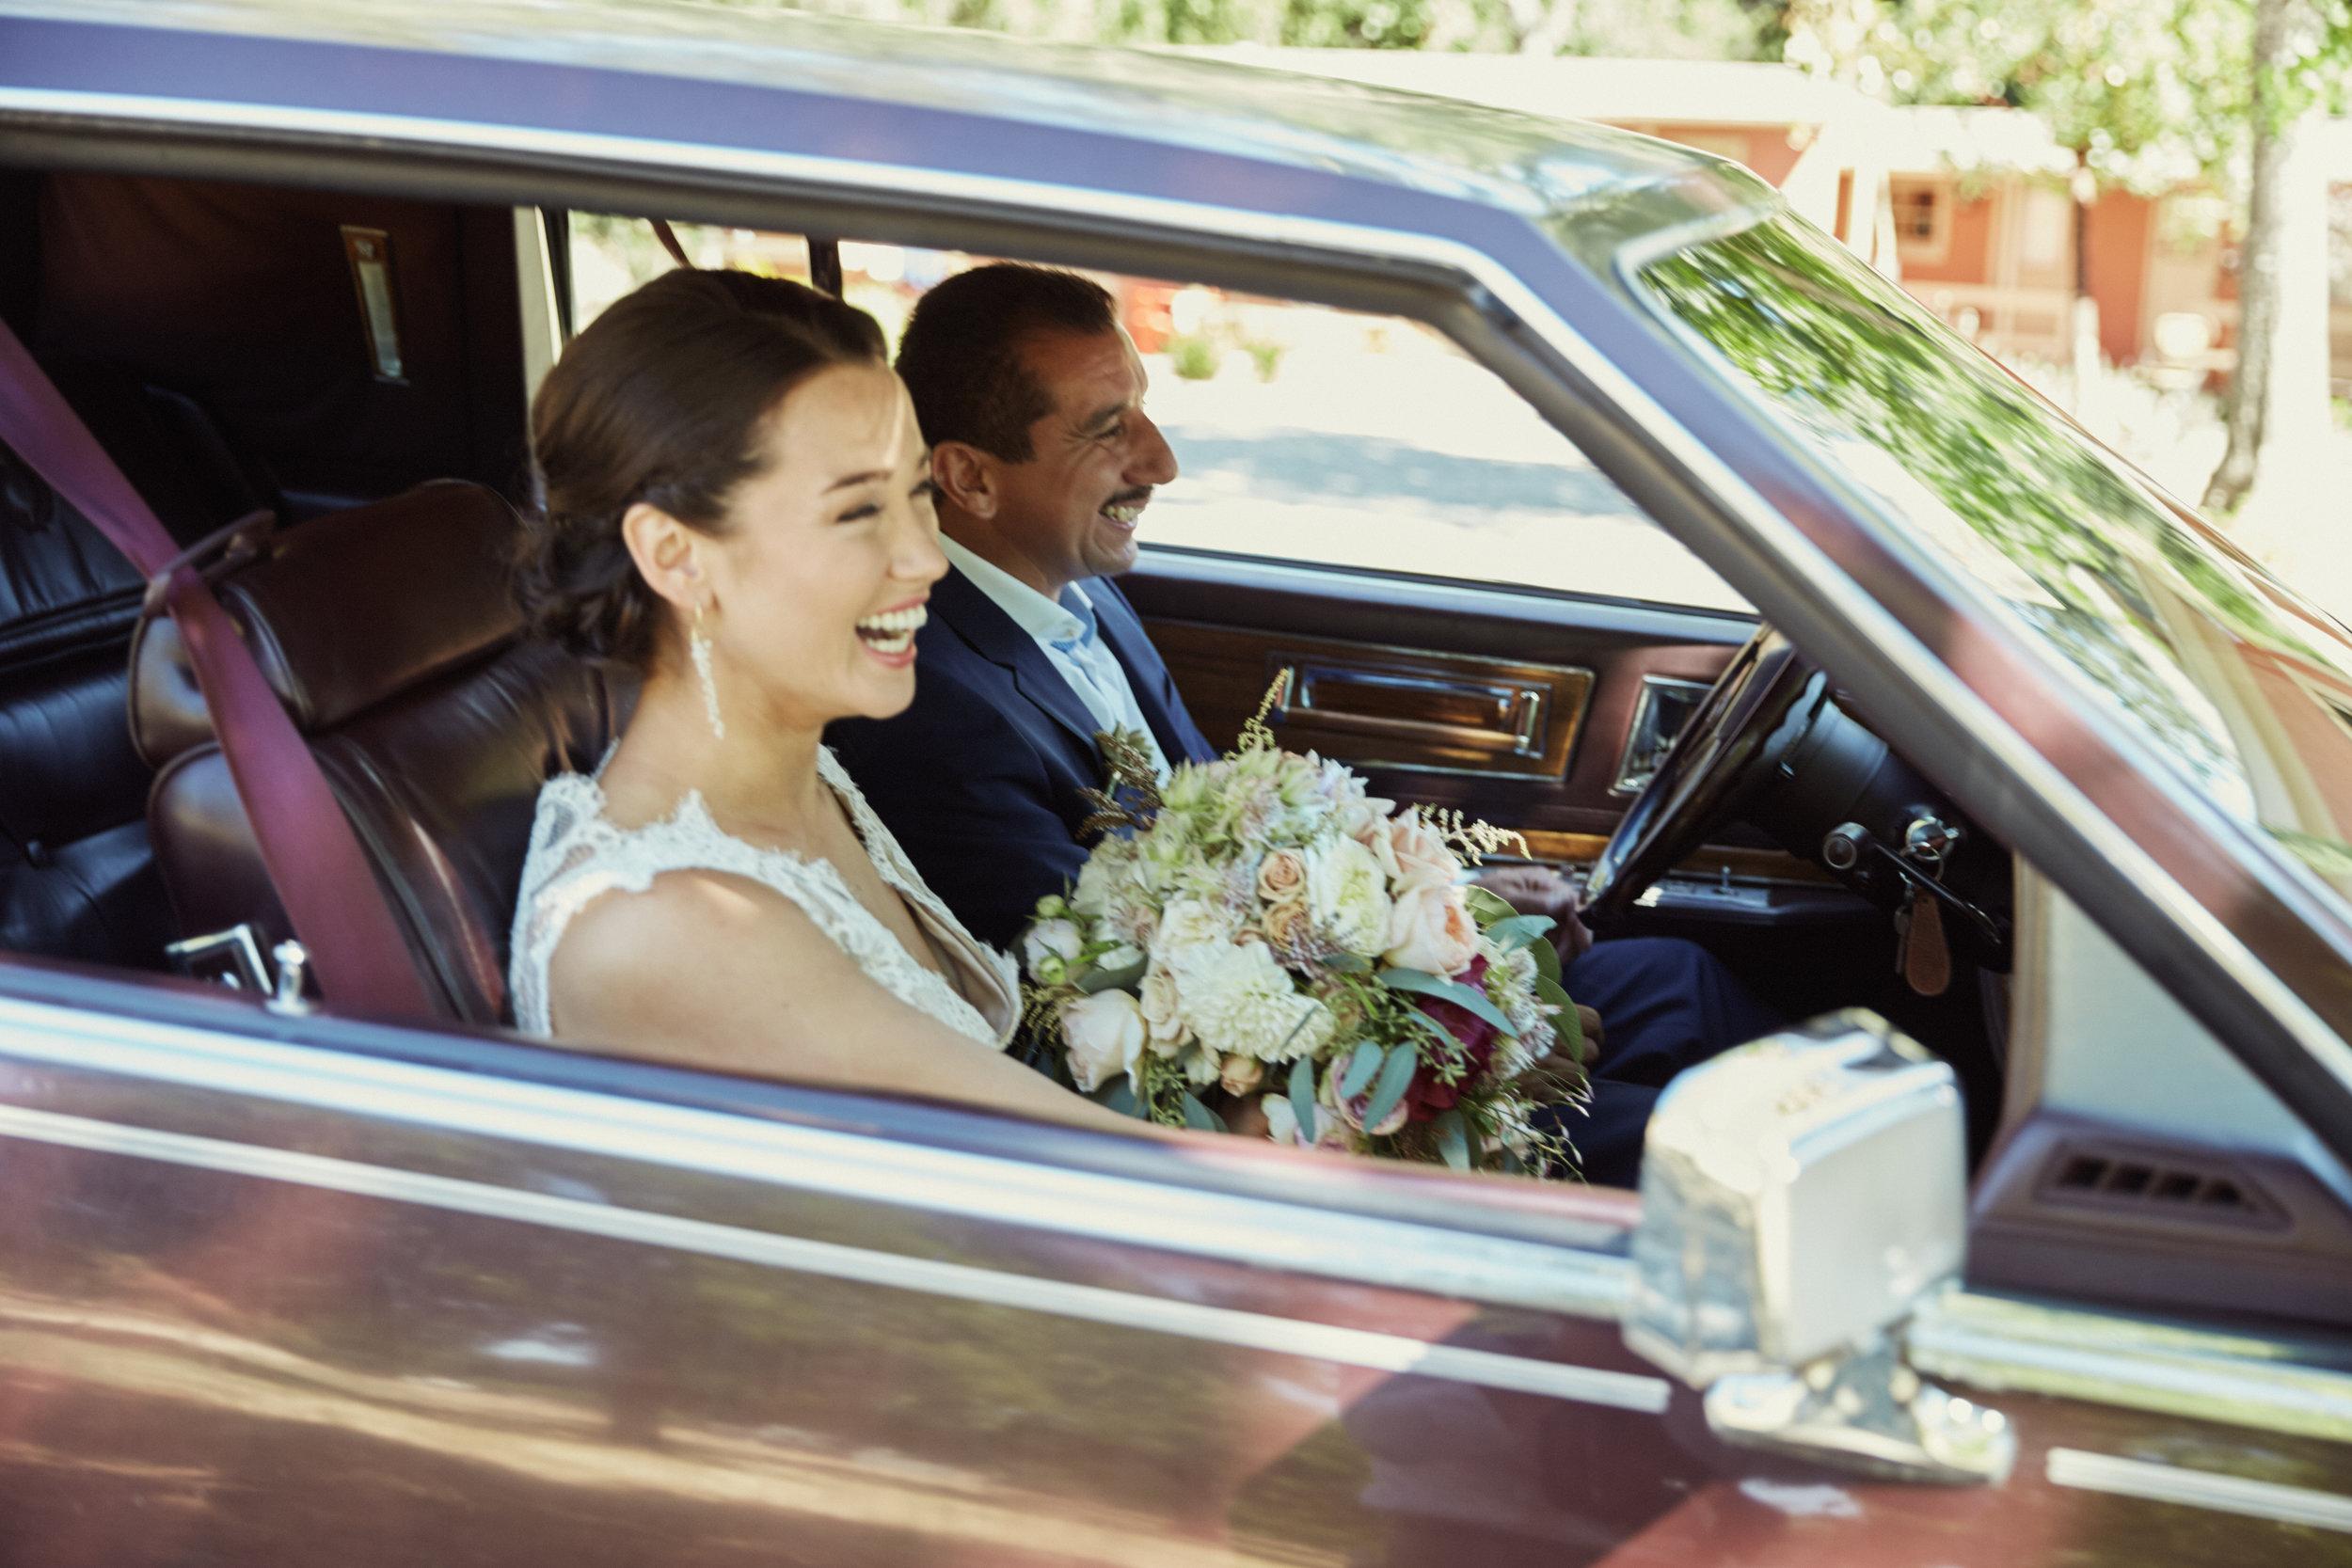 ch_201600625_tawnykeegan_wedding_1140.jpg